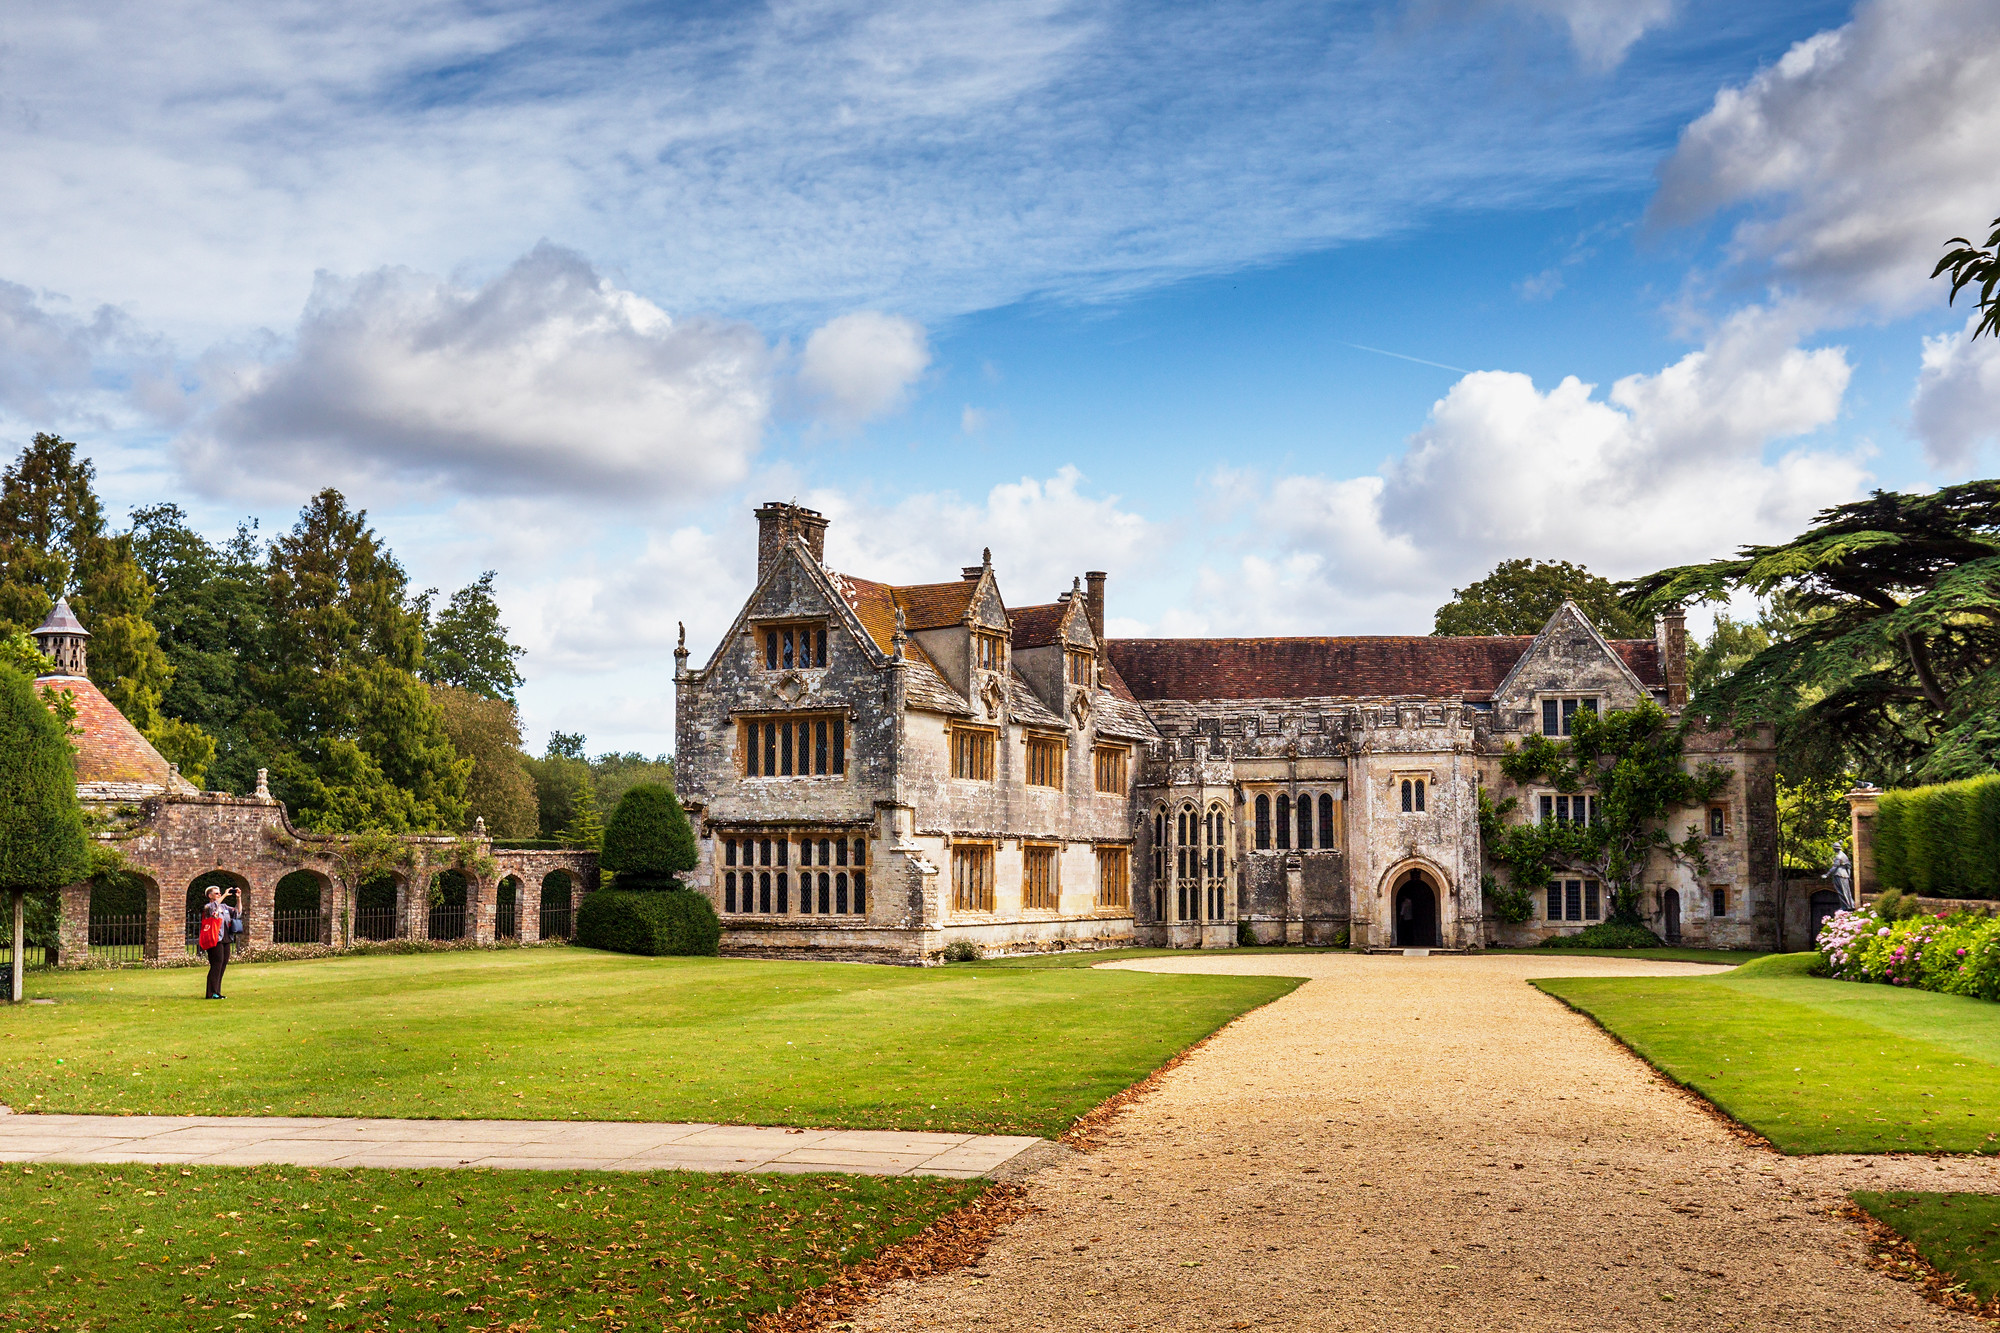 Athelhampton House & Gardens, Dorset by Jim Monk.jpg